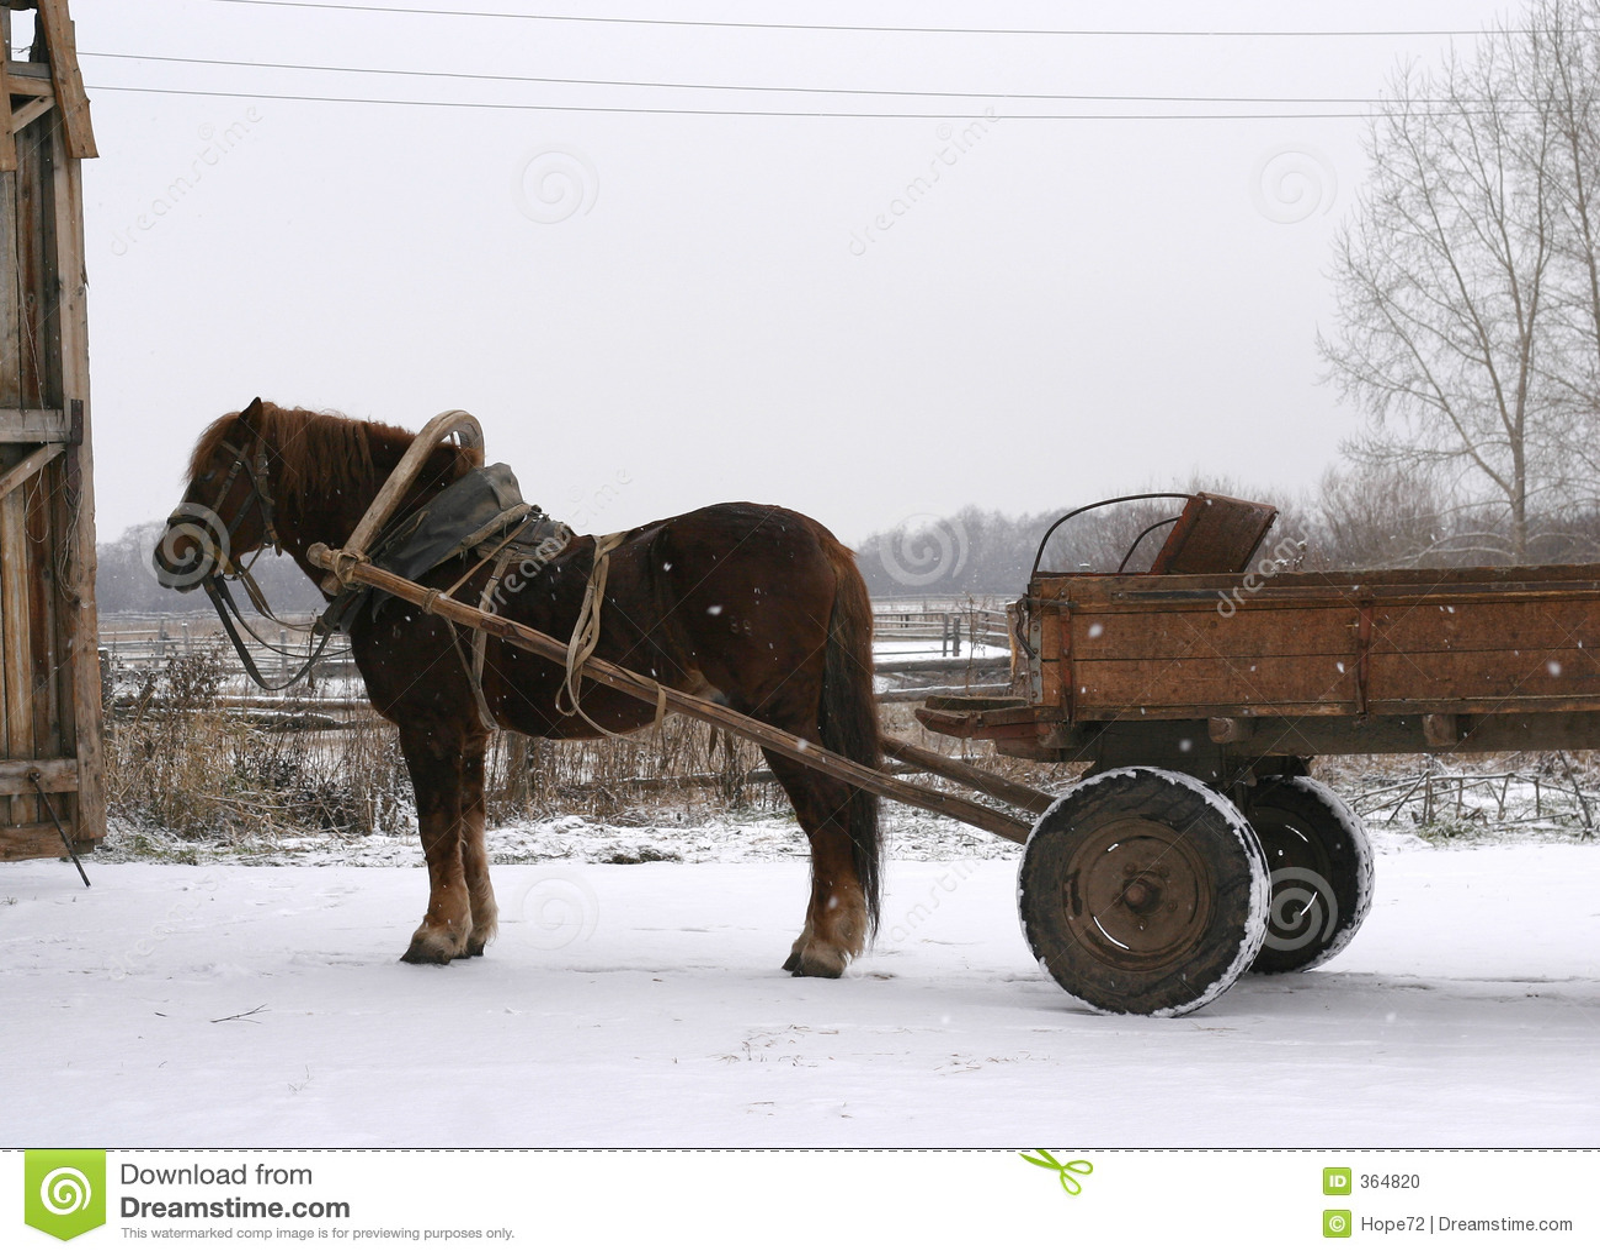 A Russian shire horse